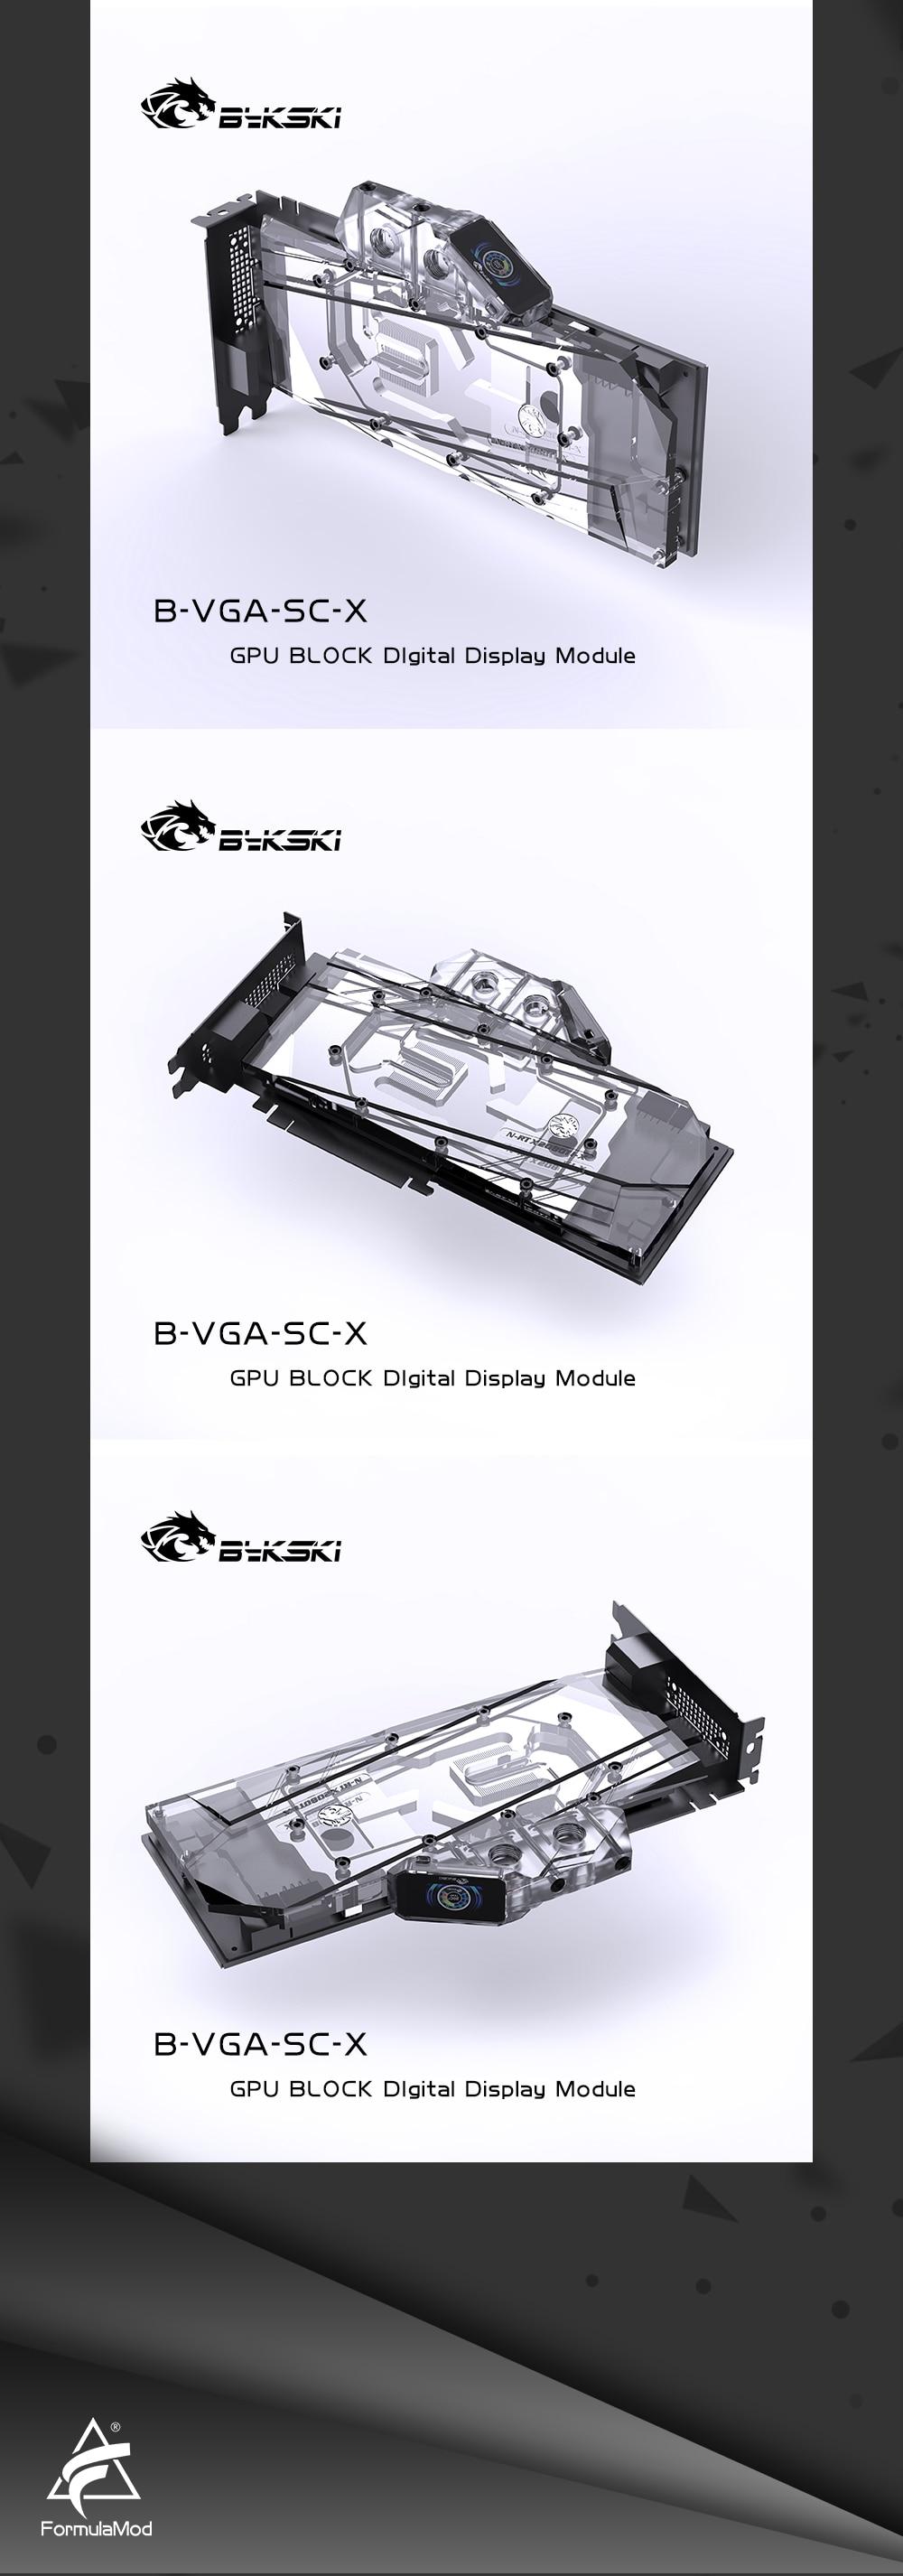 Bykski Digital GPU Thermometer for Computer GPU Cooling Water Block Cooler With Color Display, B-VGA-SC-X